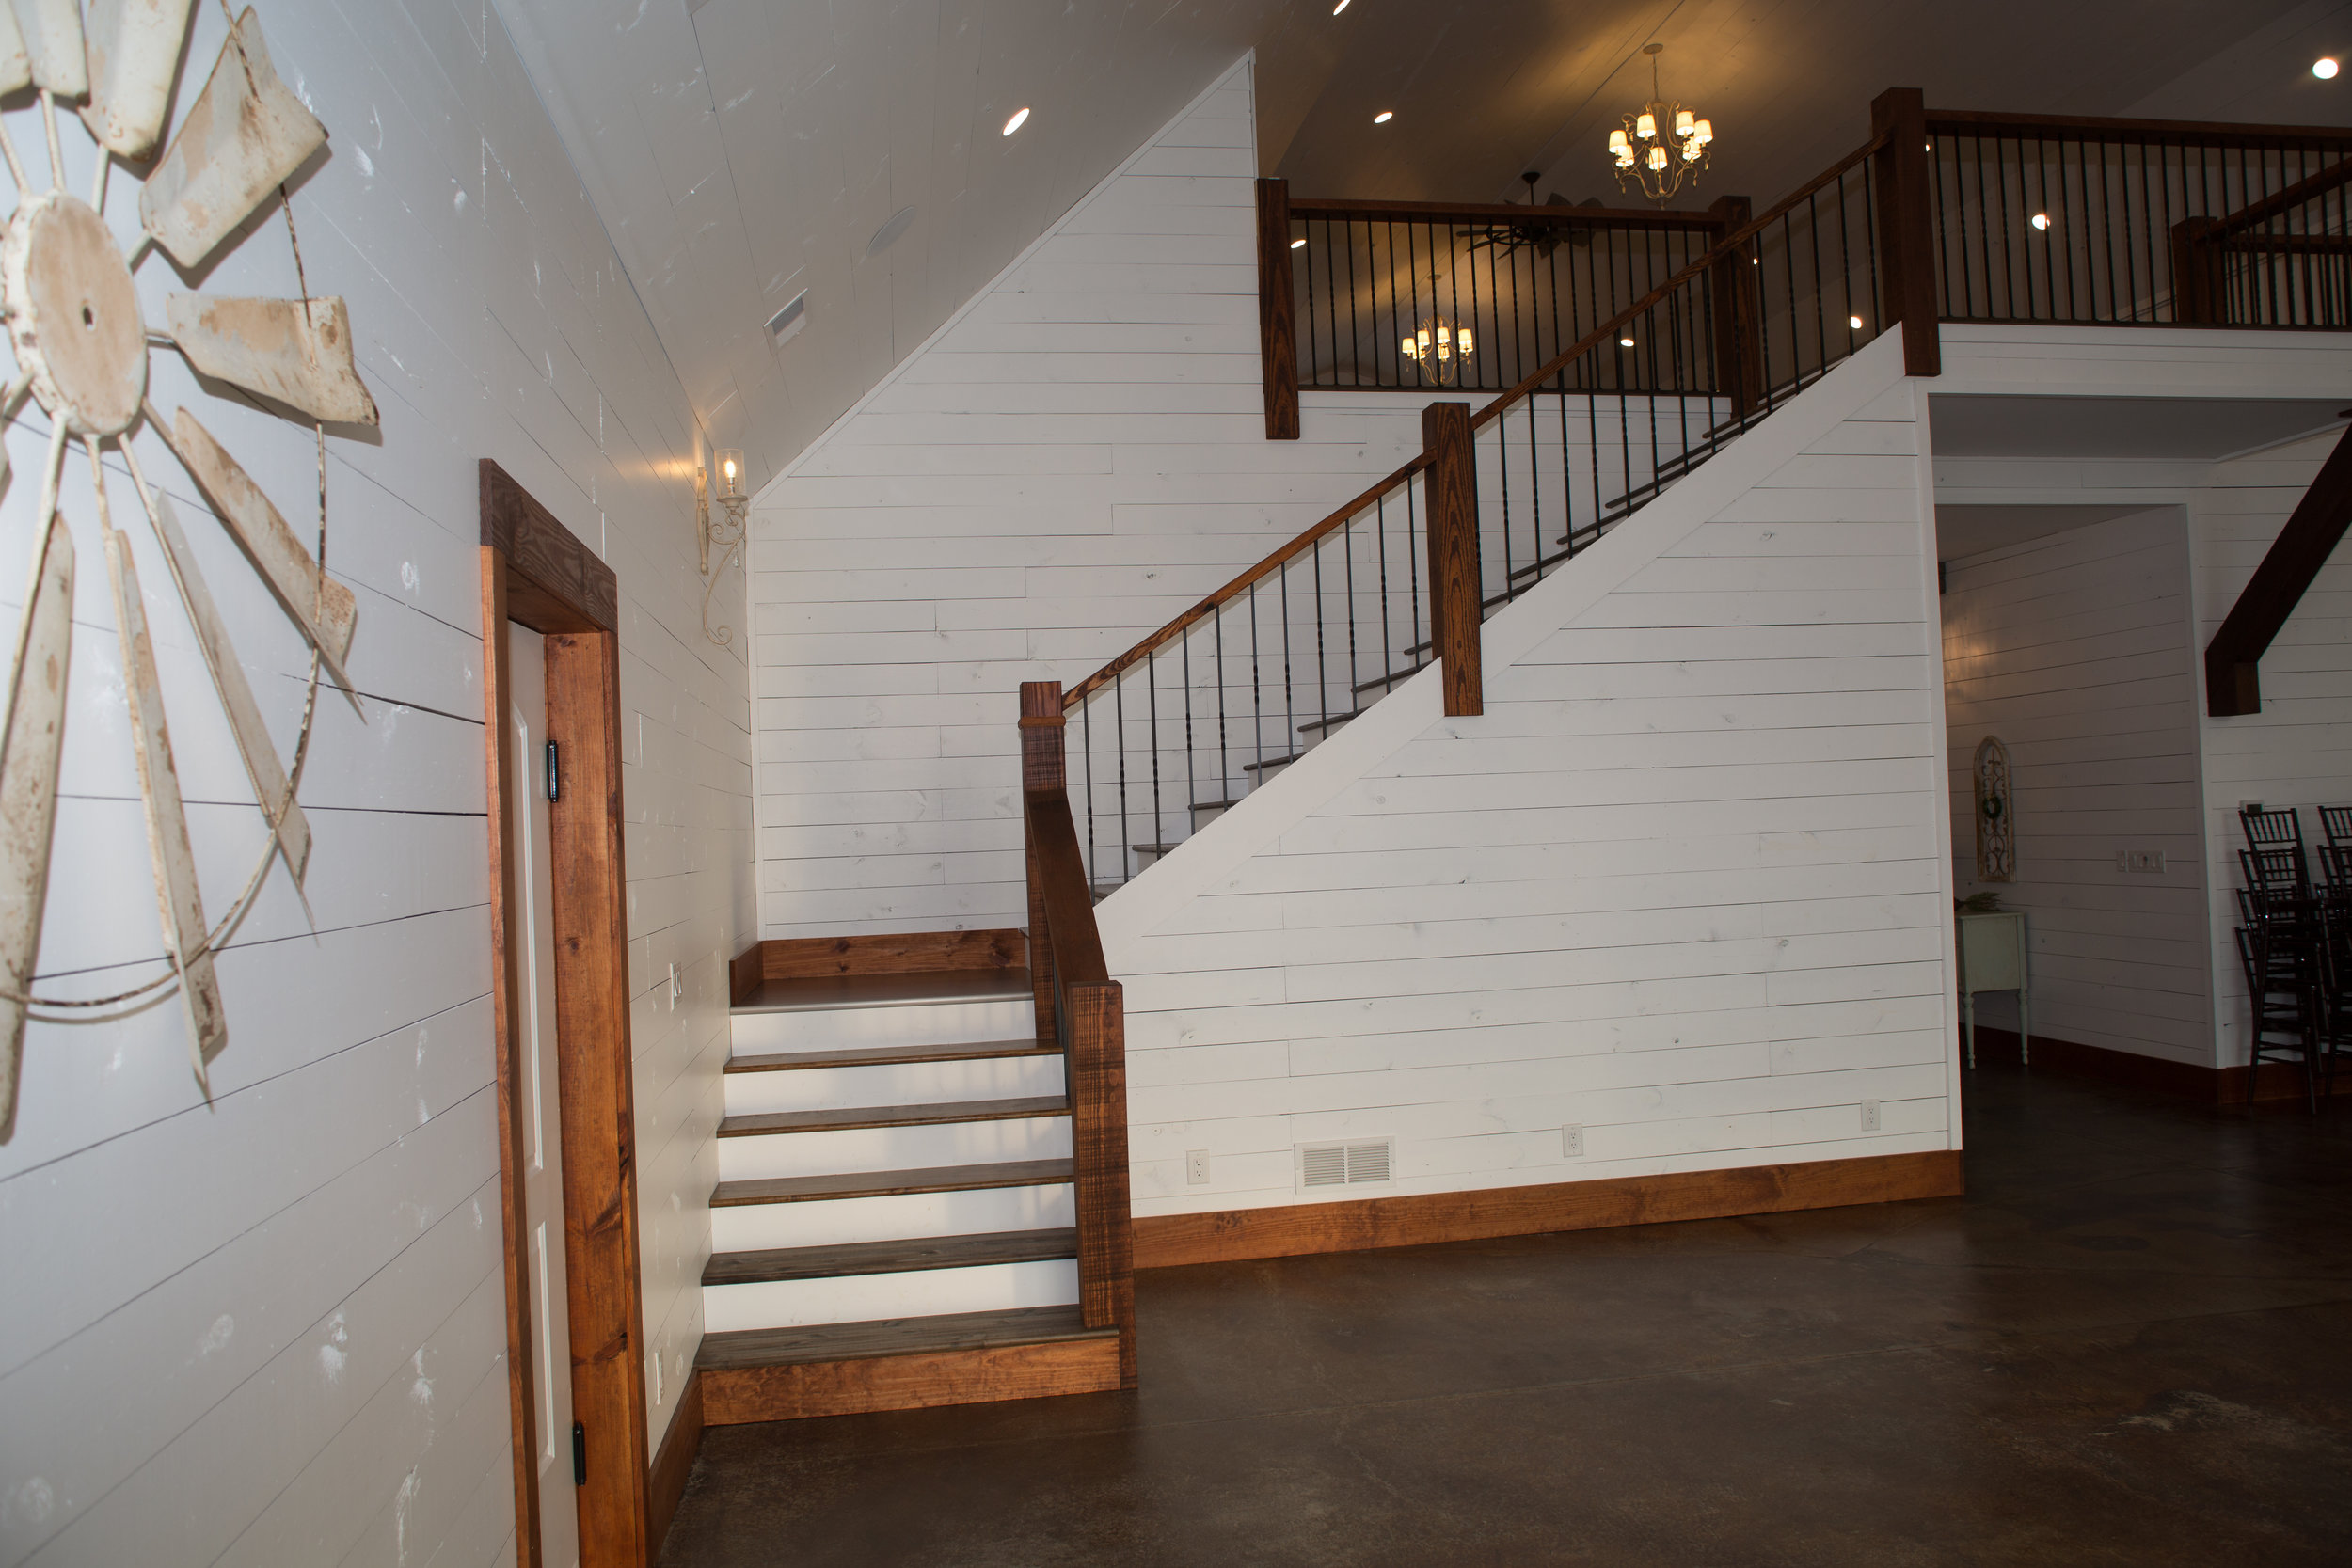 Stairway to open loft.